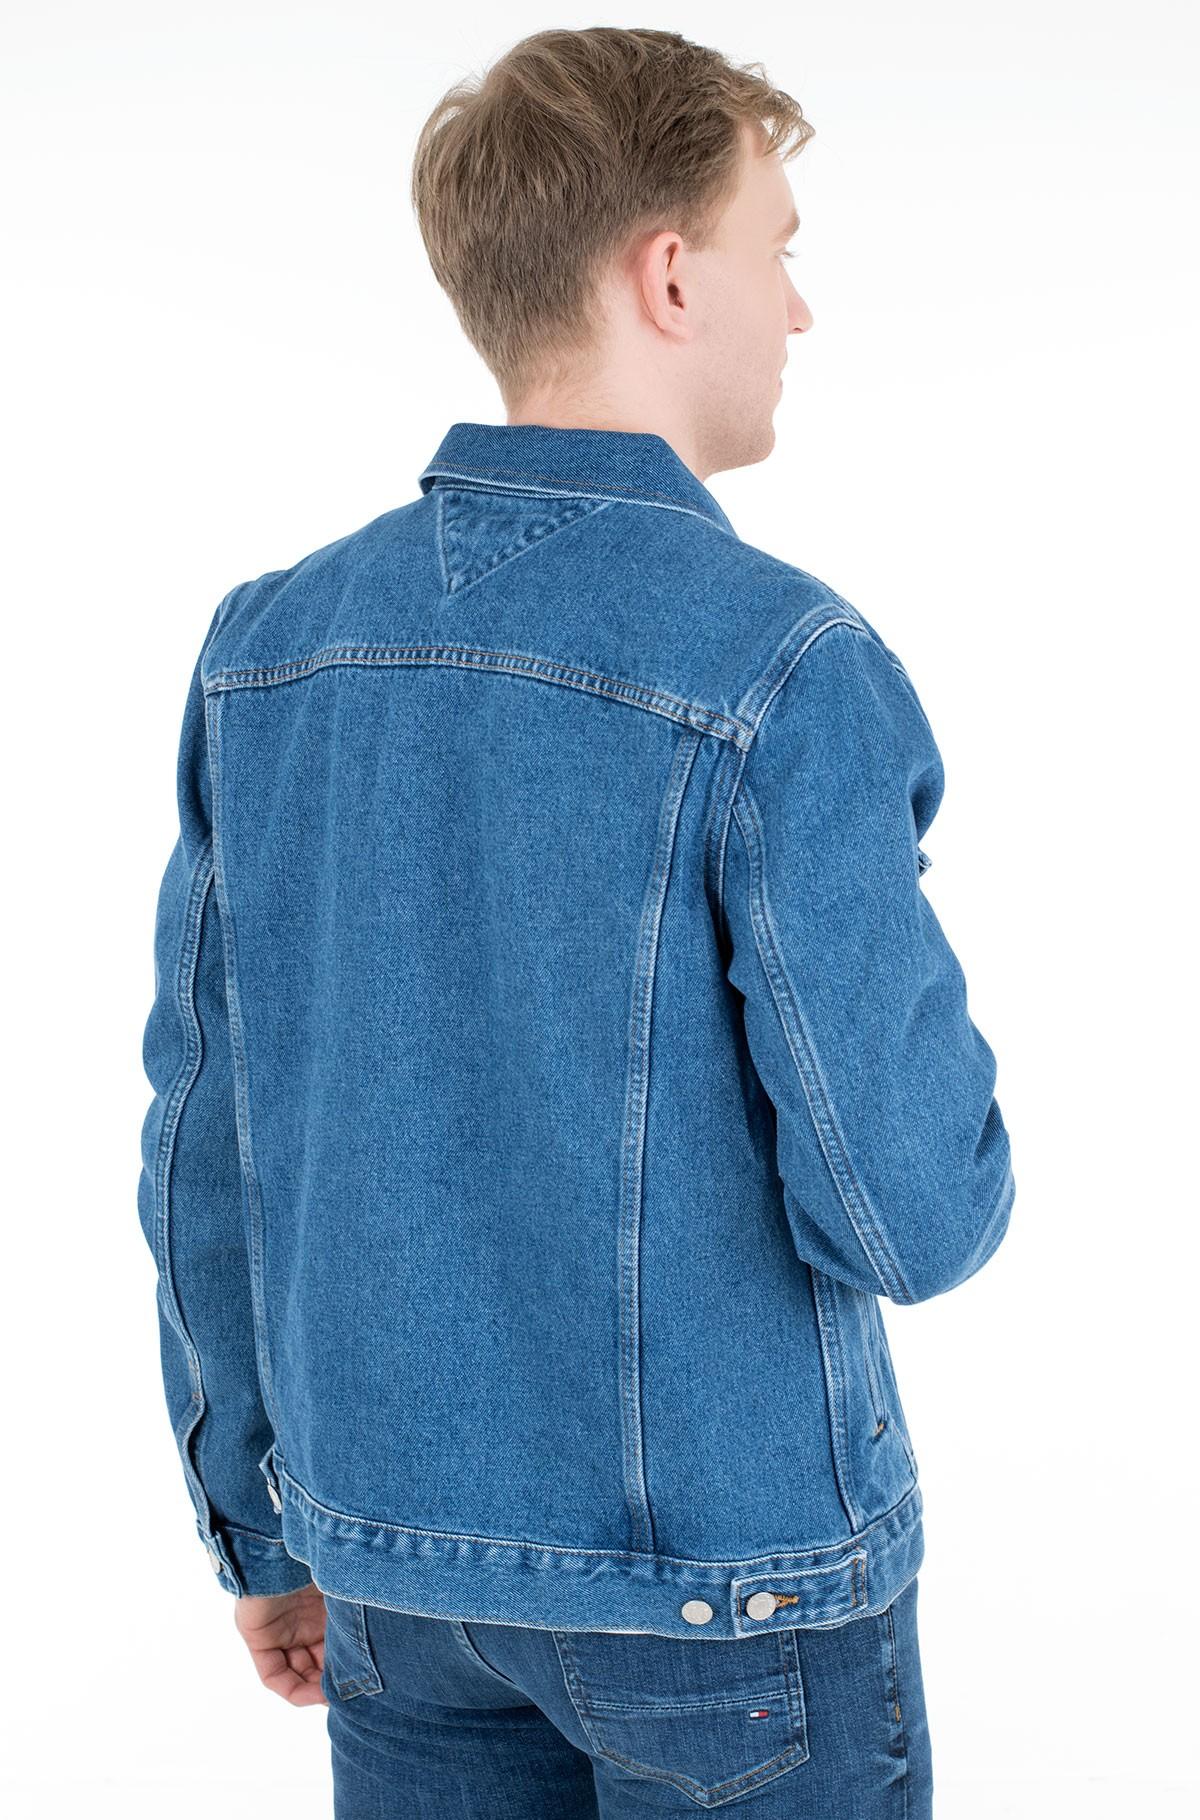 Denim jacket TRUCKER JKT RGD PORTLAND INDIGO-full-2